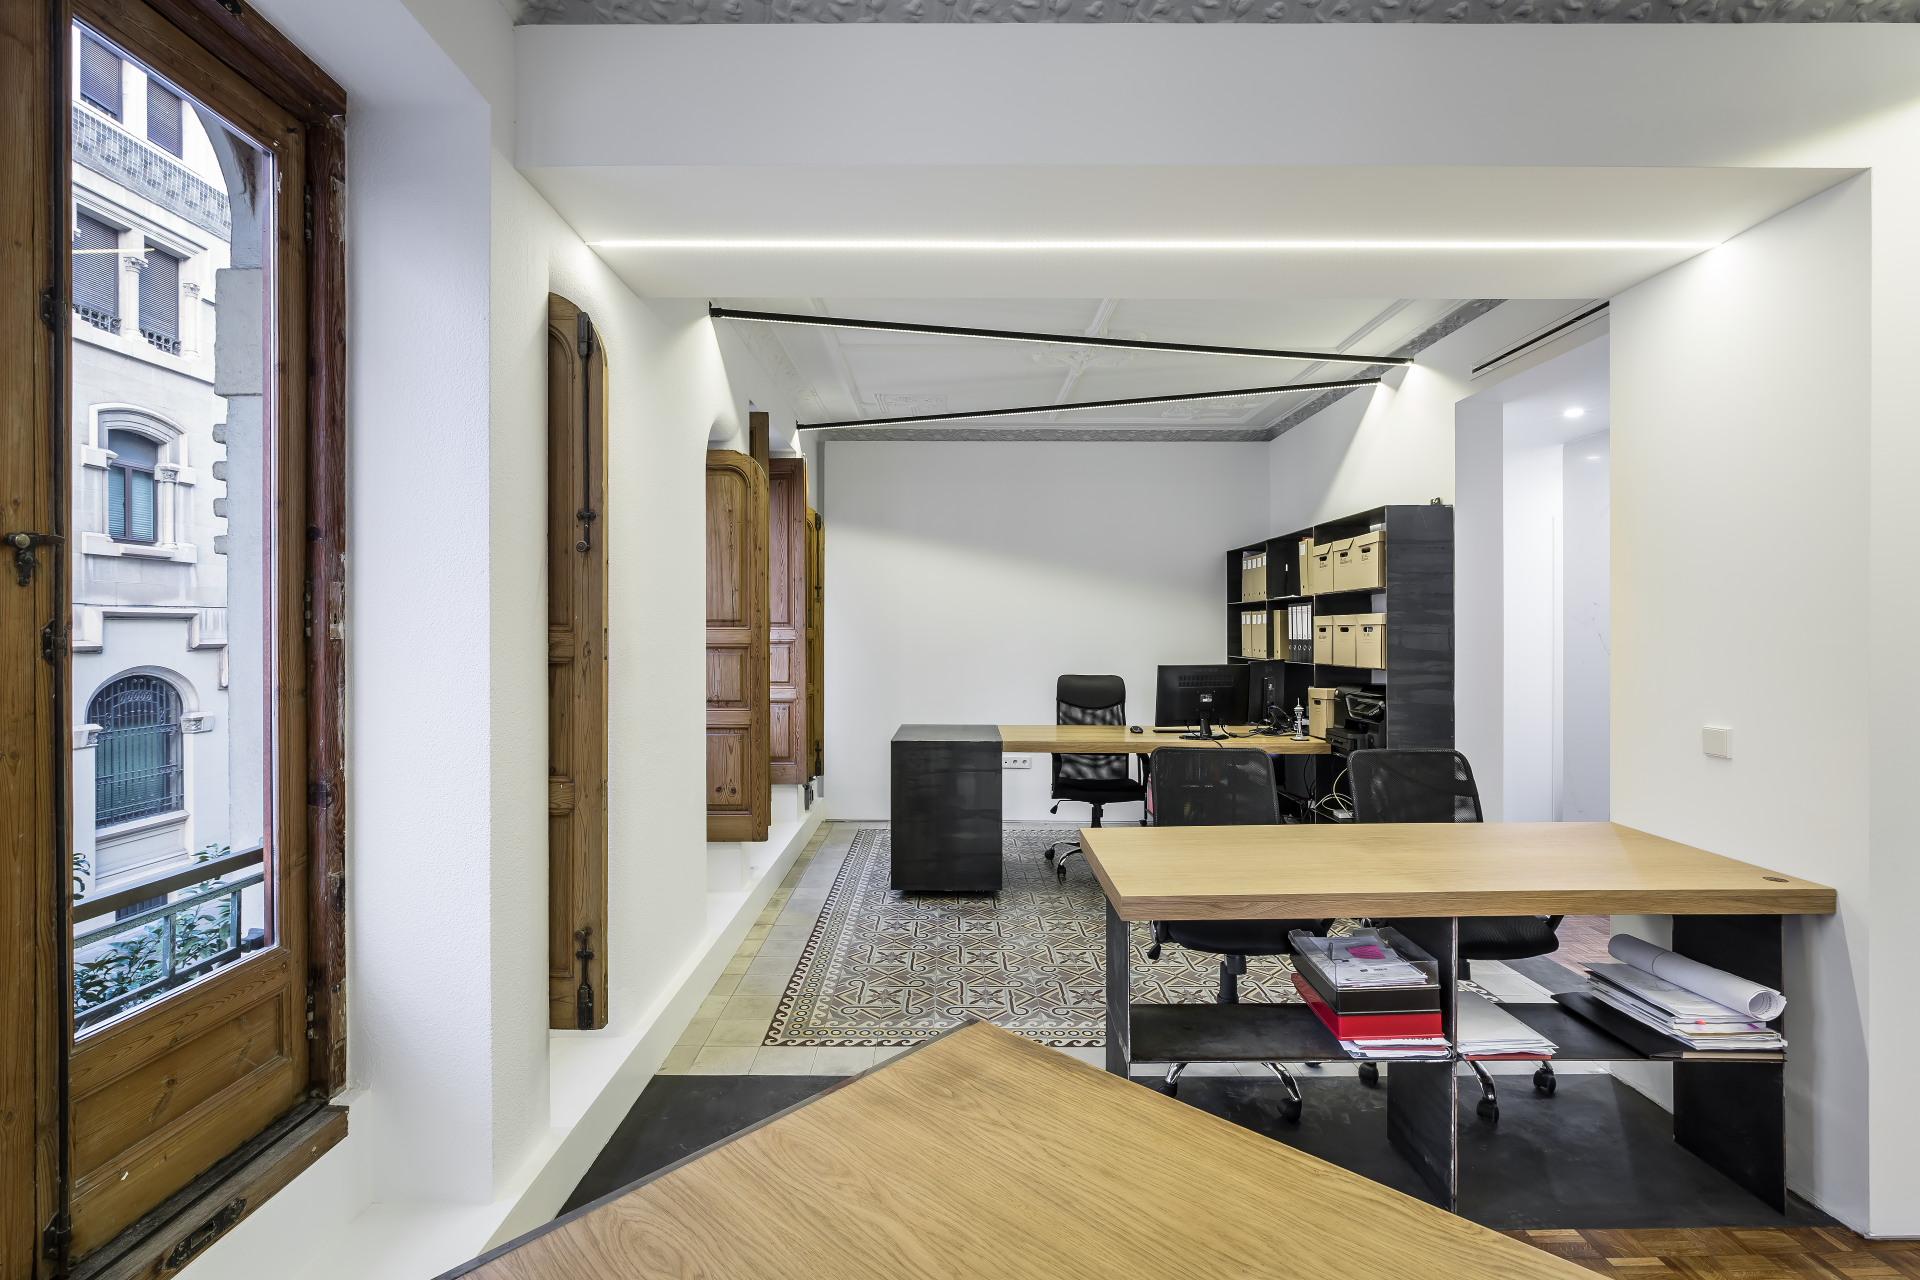 fotografia-arquitectura-interiorismo-valencia-german-cabo-viraje-estudio-pujol (9)